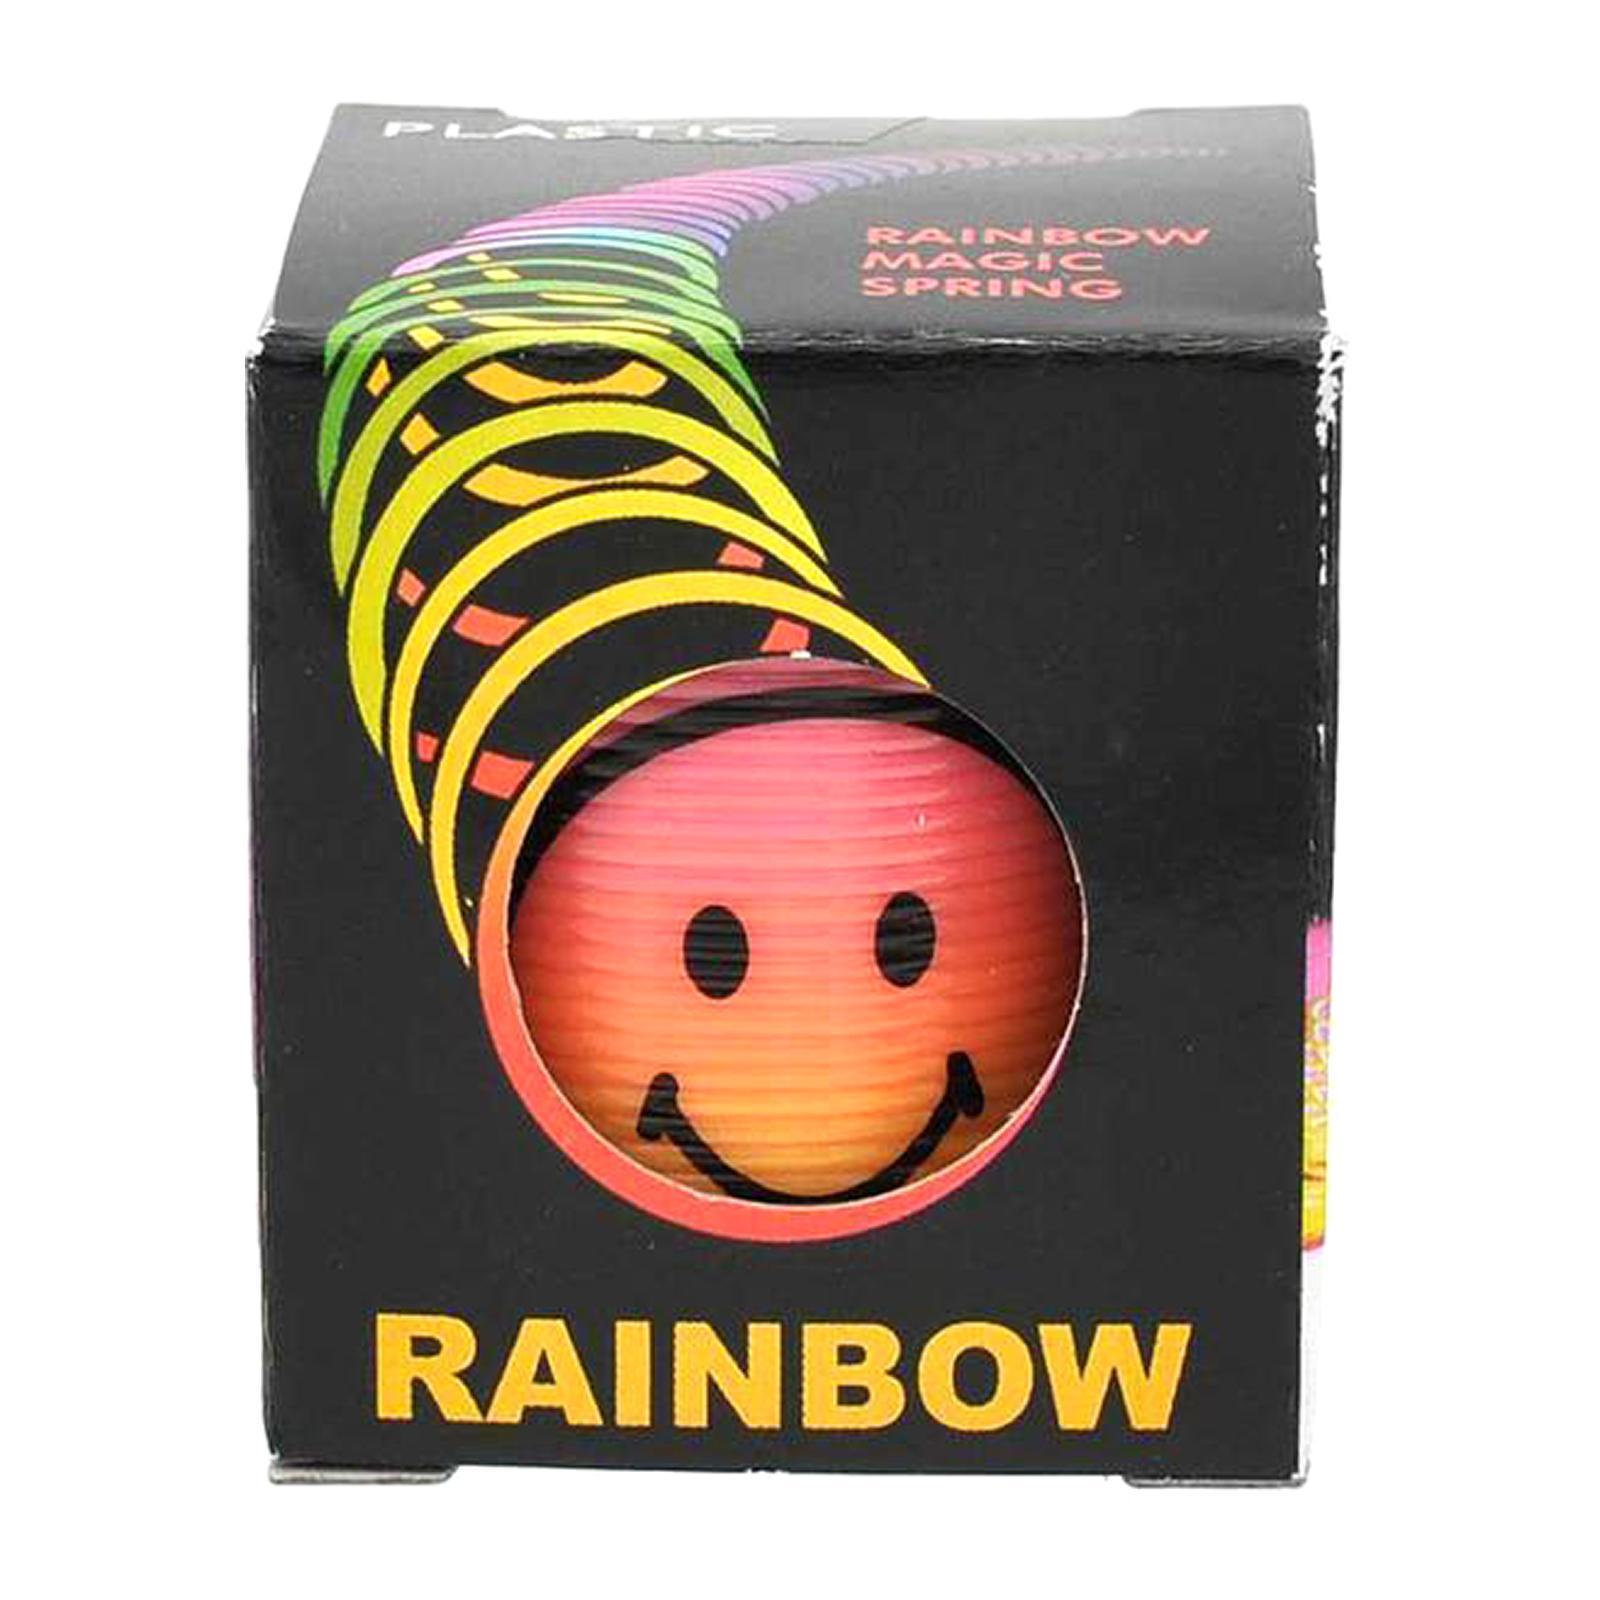 MTRADE Mini Smile Face Rainbow Magic Spring Toy 1 PCS/ Box